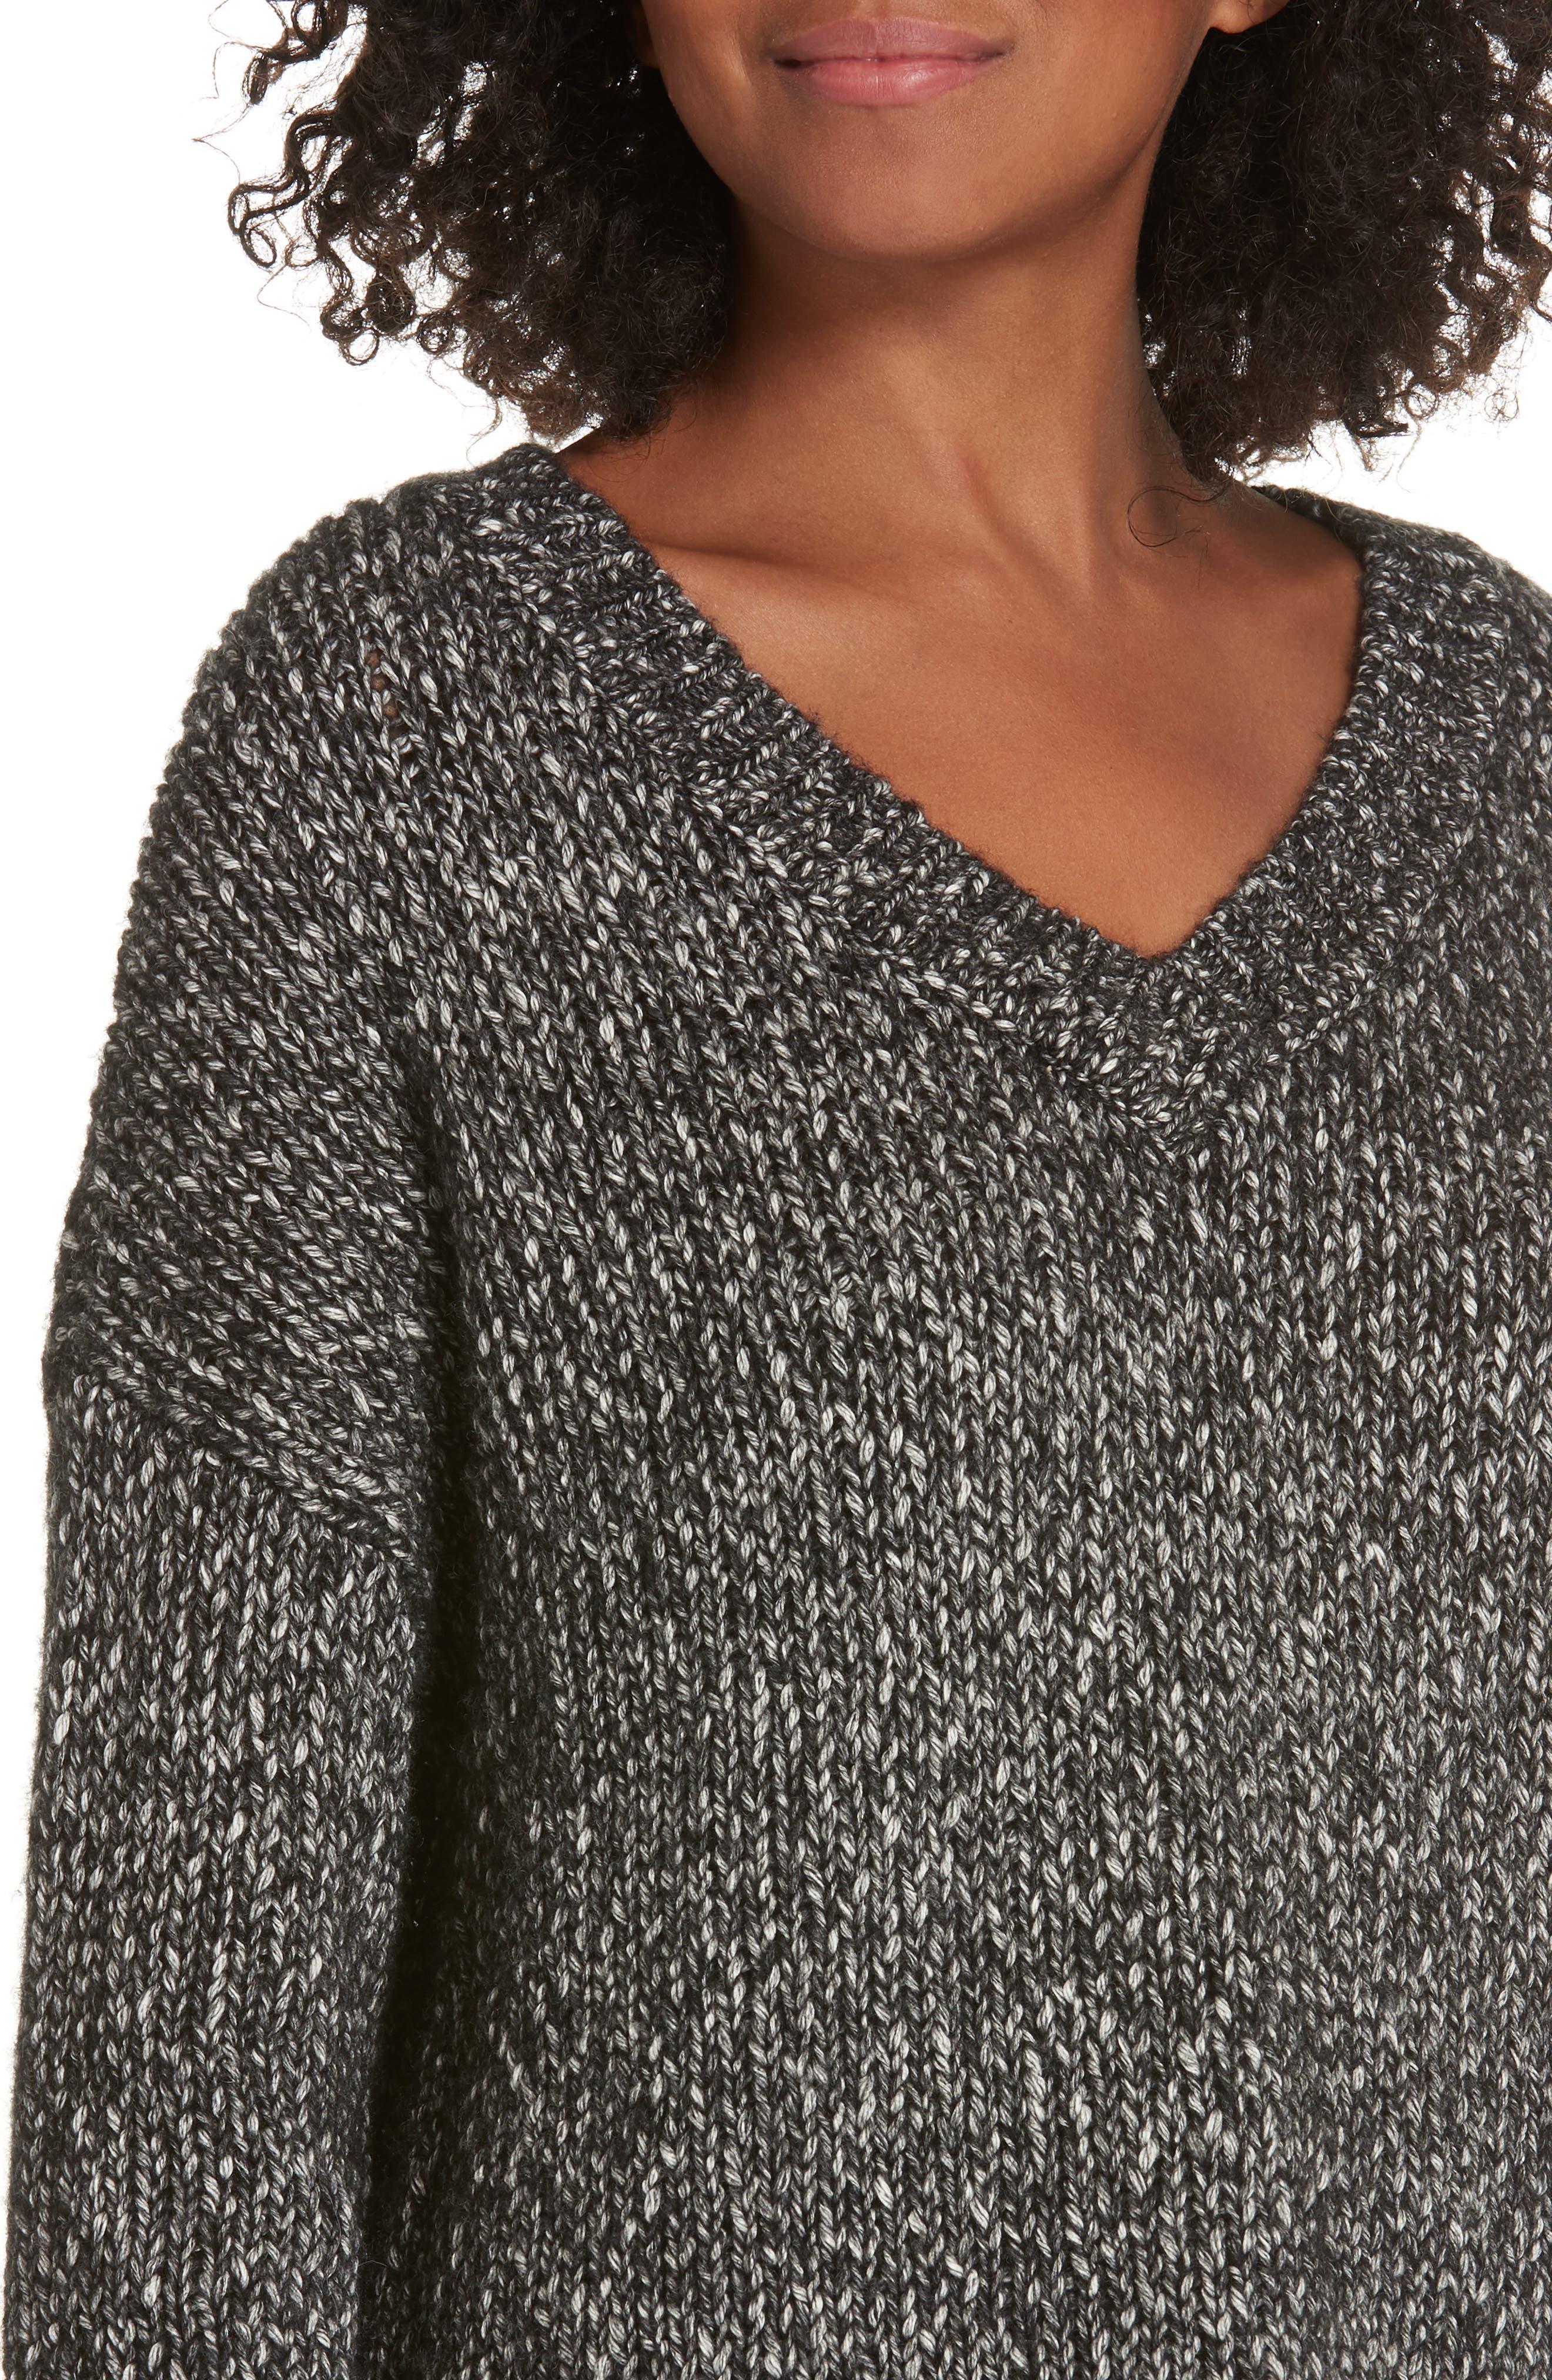 Parkland Slouchy Cotton & Wool Sweater,                             Alternate thumbnail 4, color,                             LEAD MELANGE